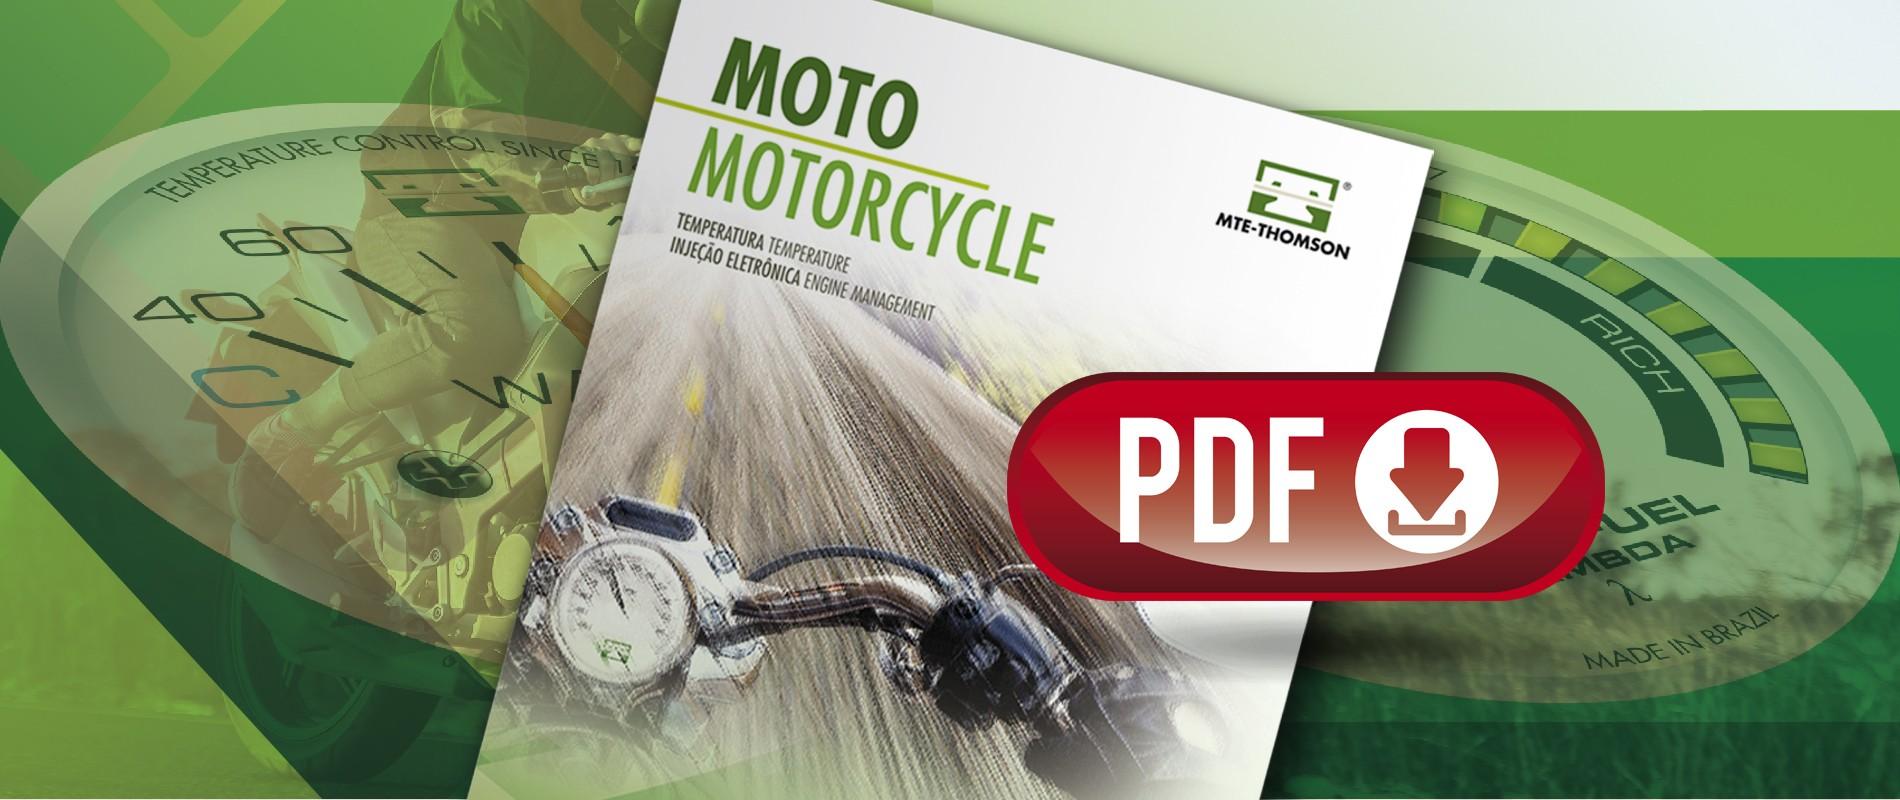 2 MTE Banner MOTO CAT PDF